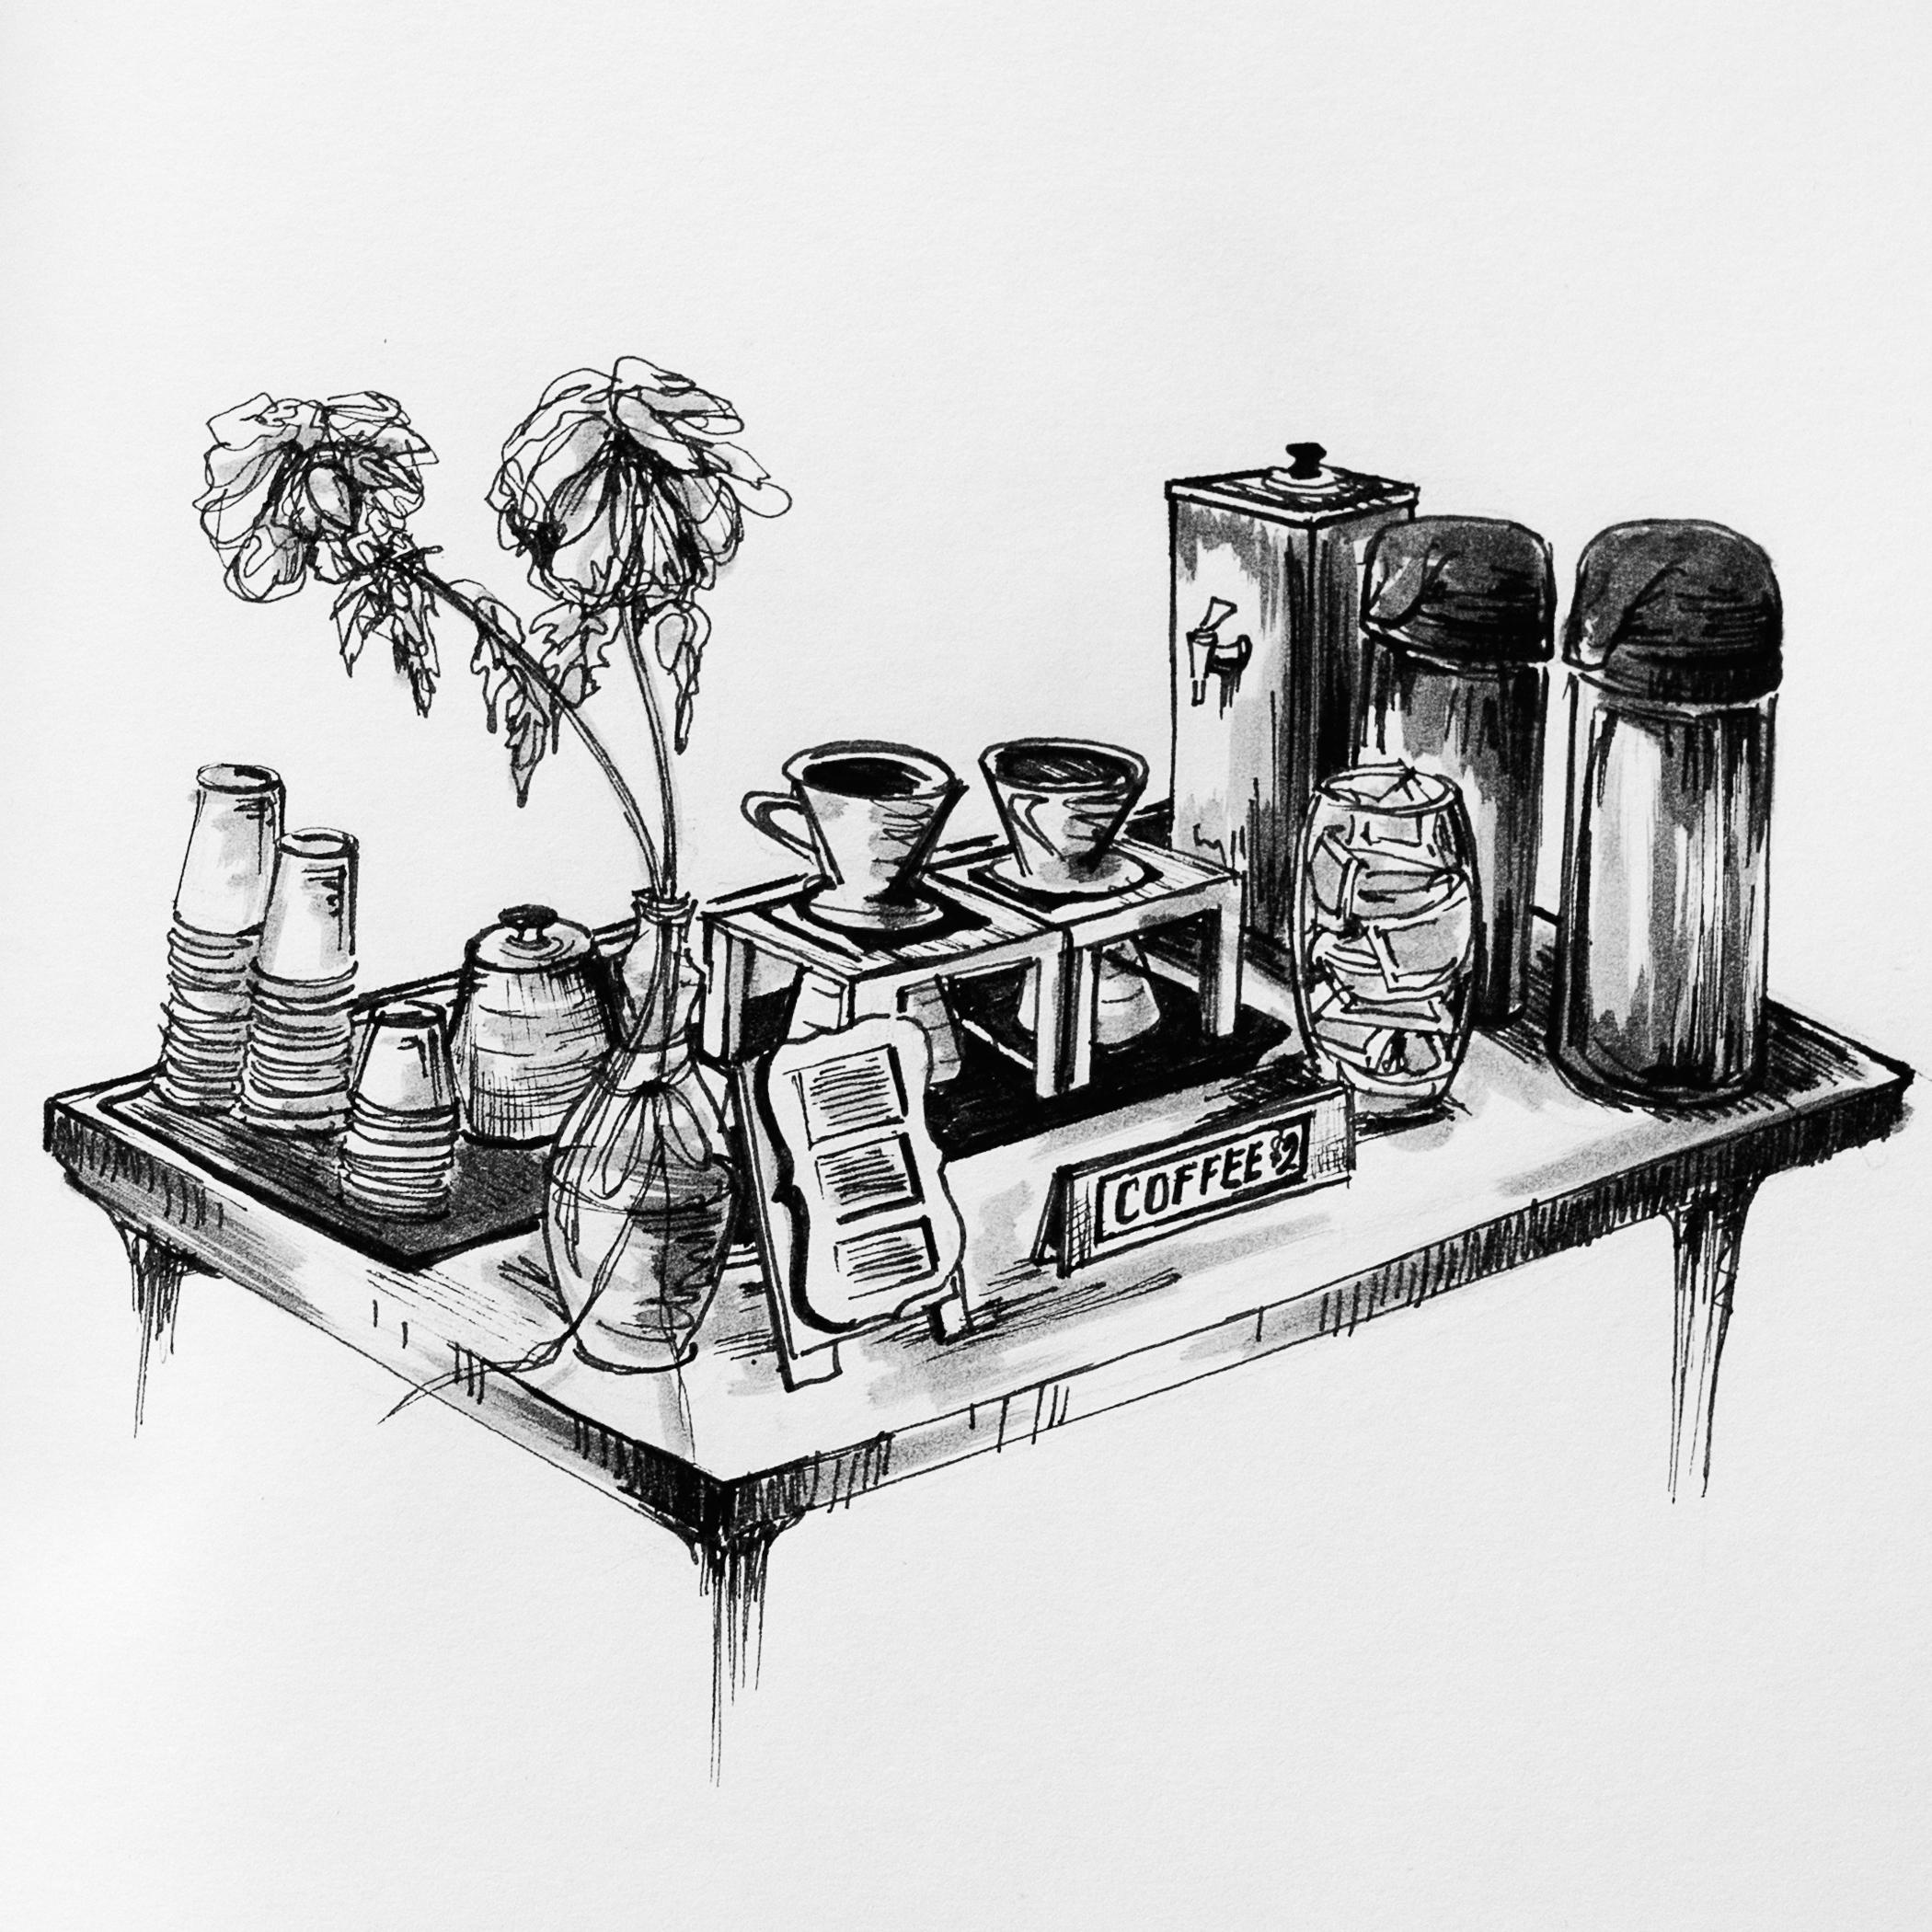 Illustration by Mary Jhun Dandan.